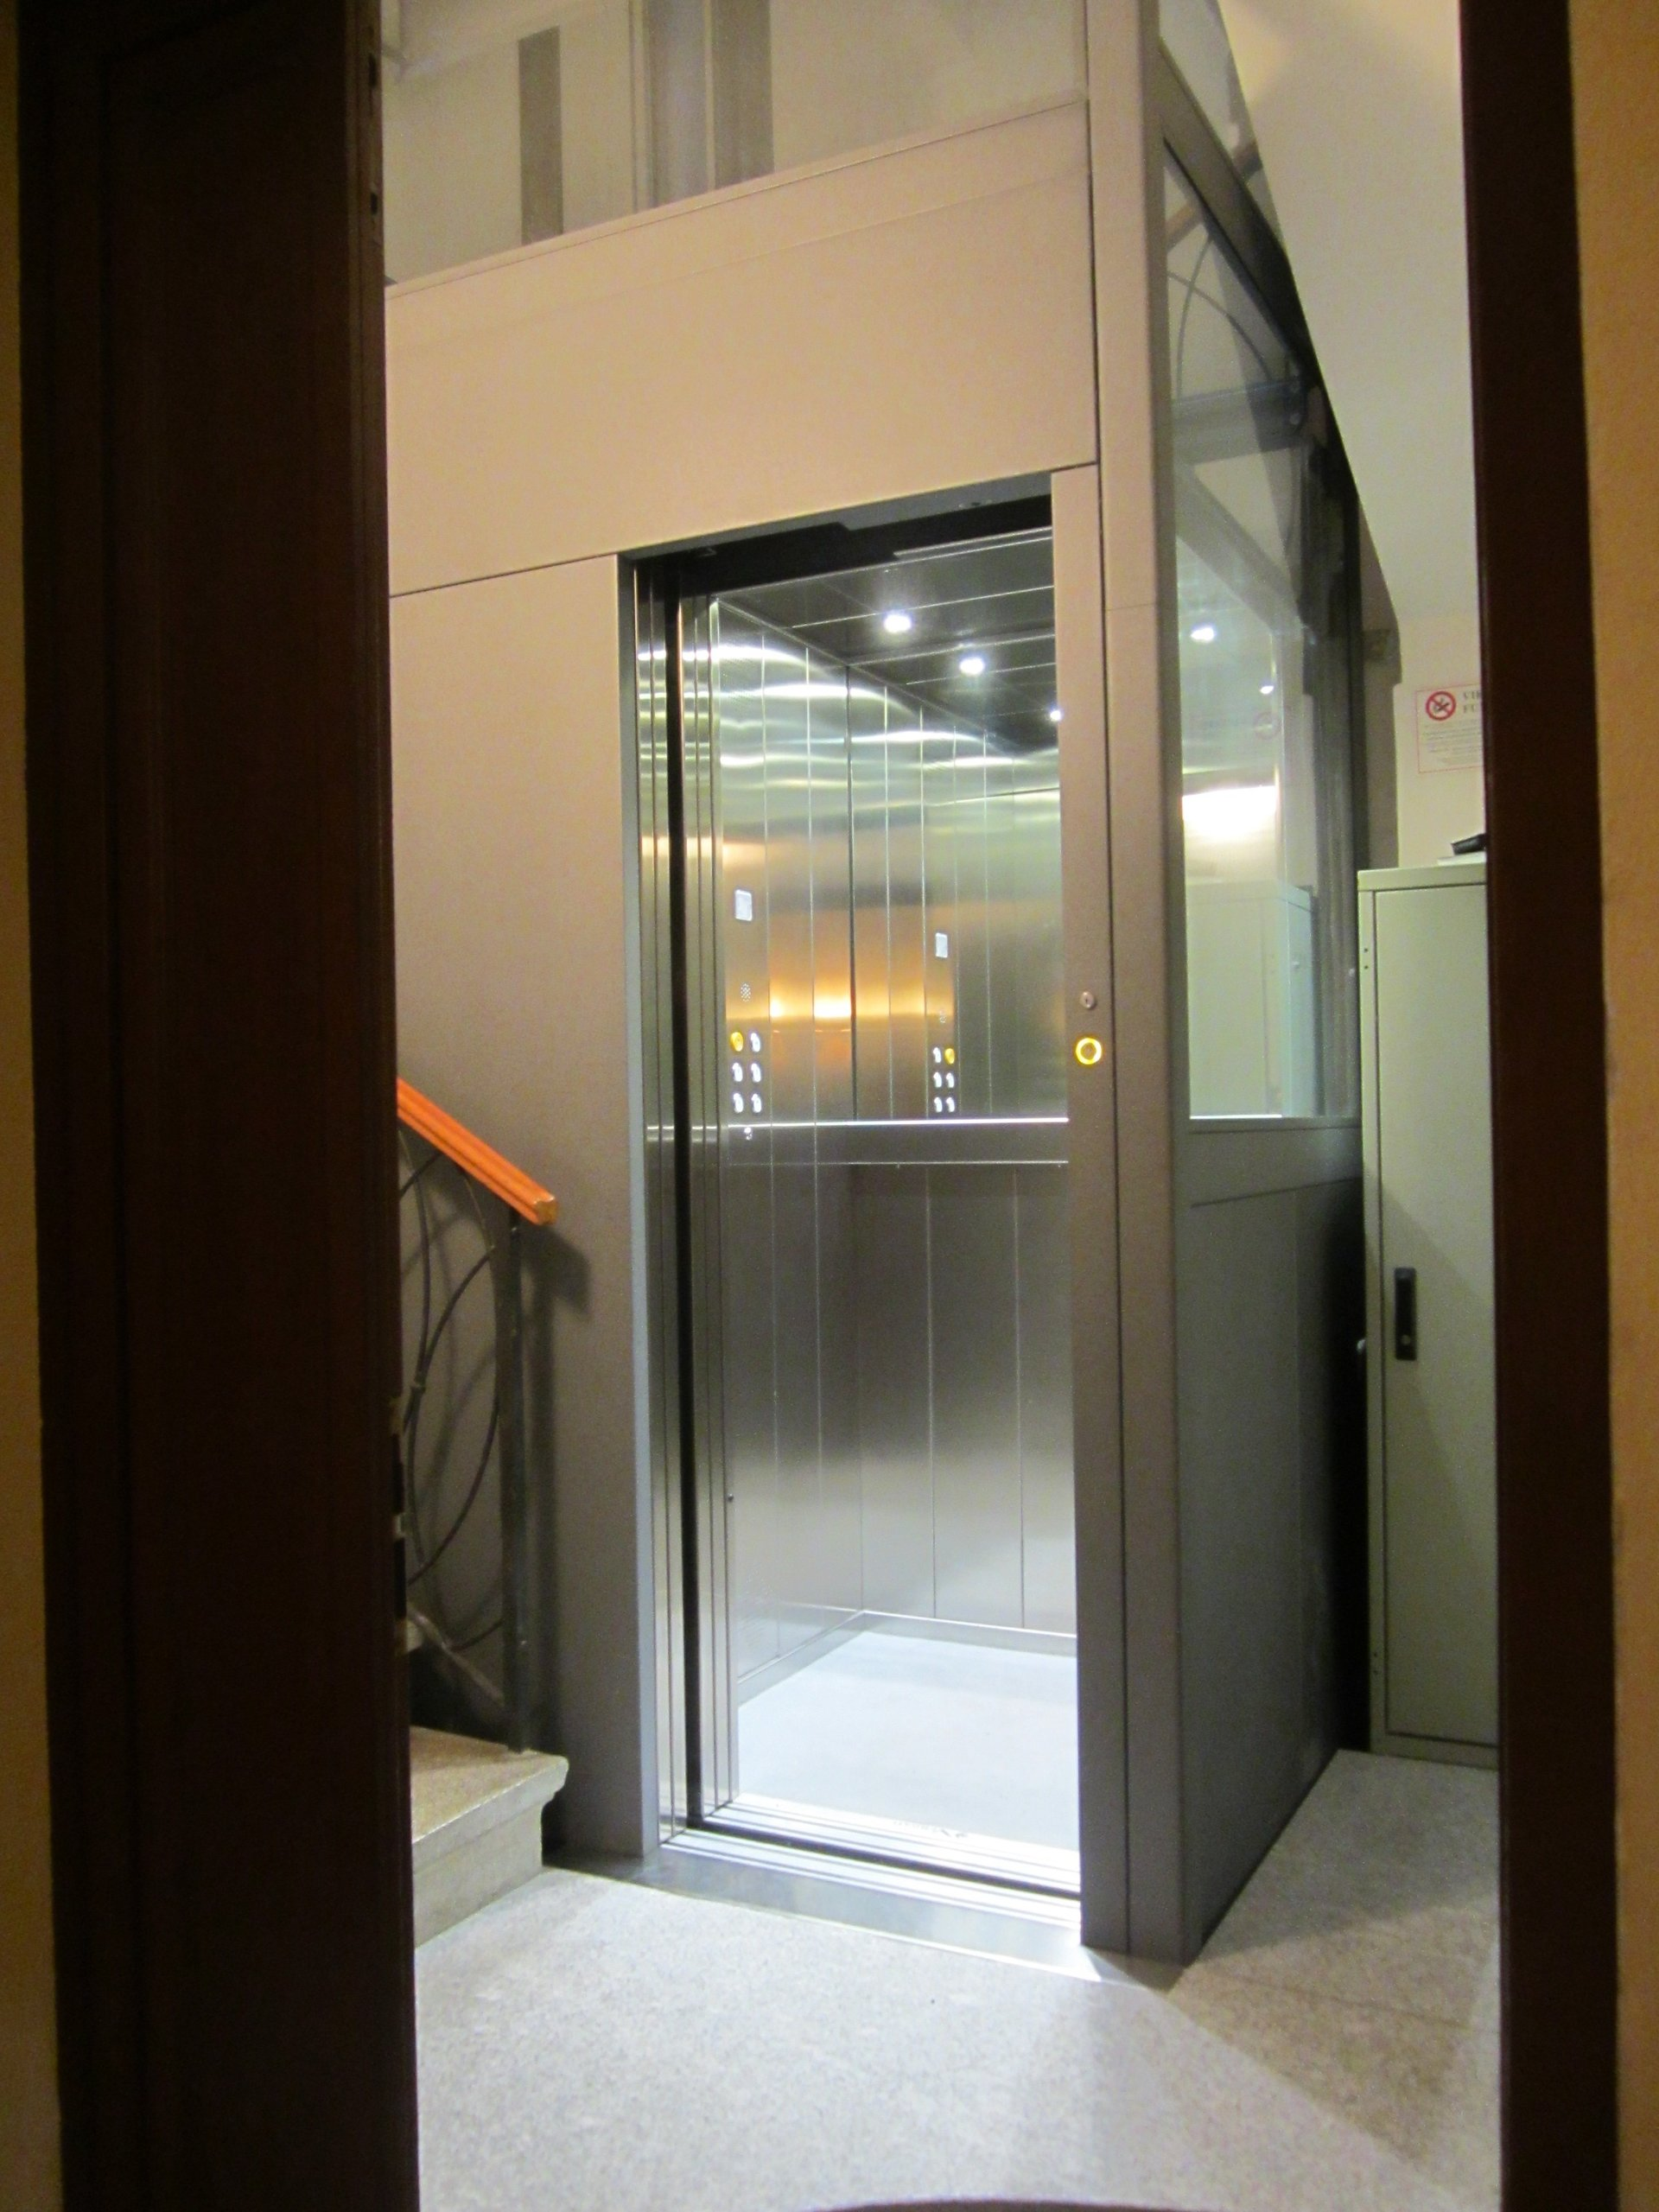 ascensore panoramica interni